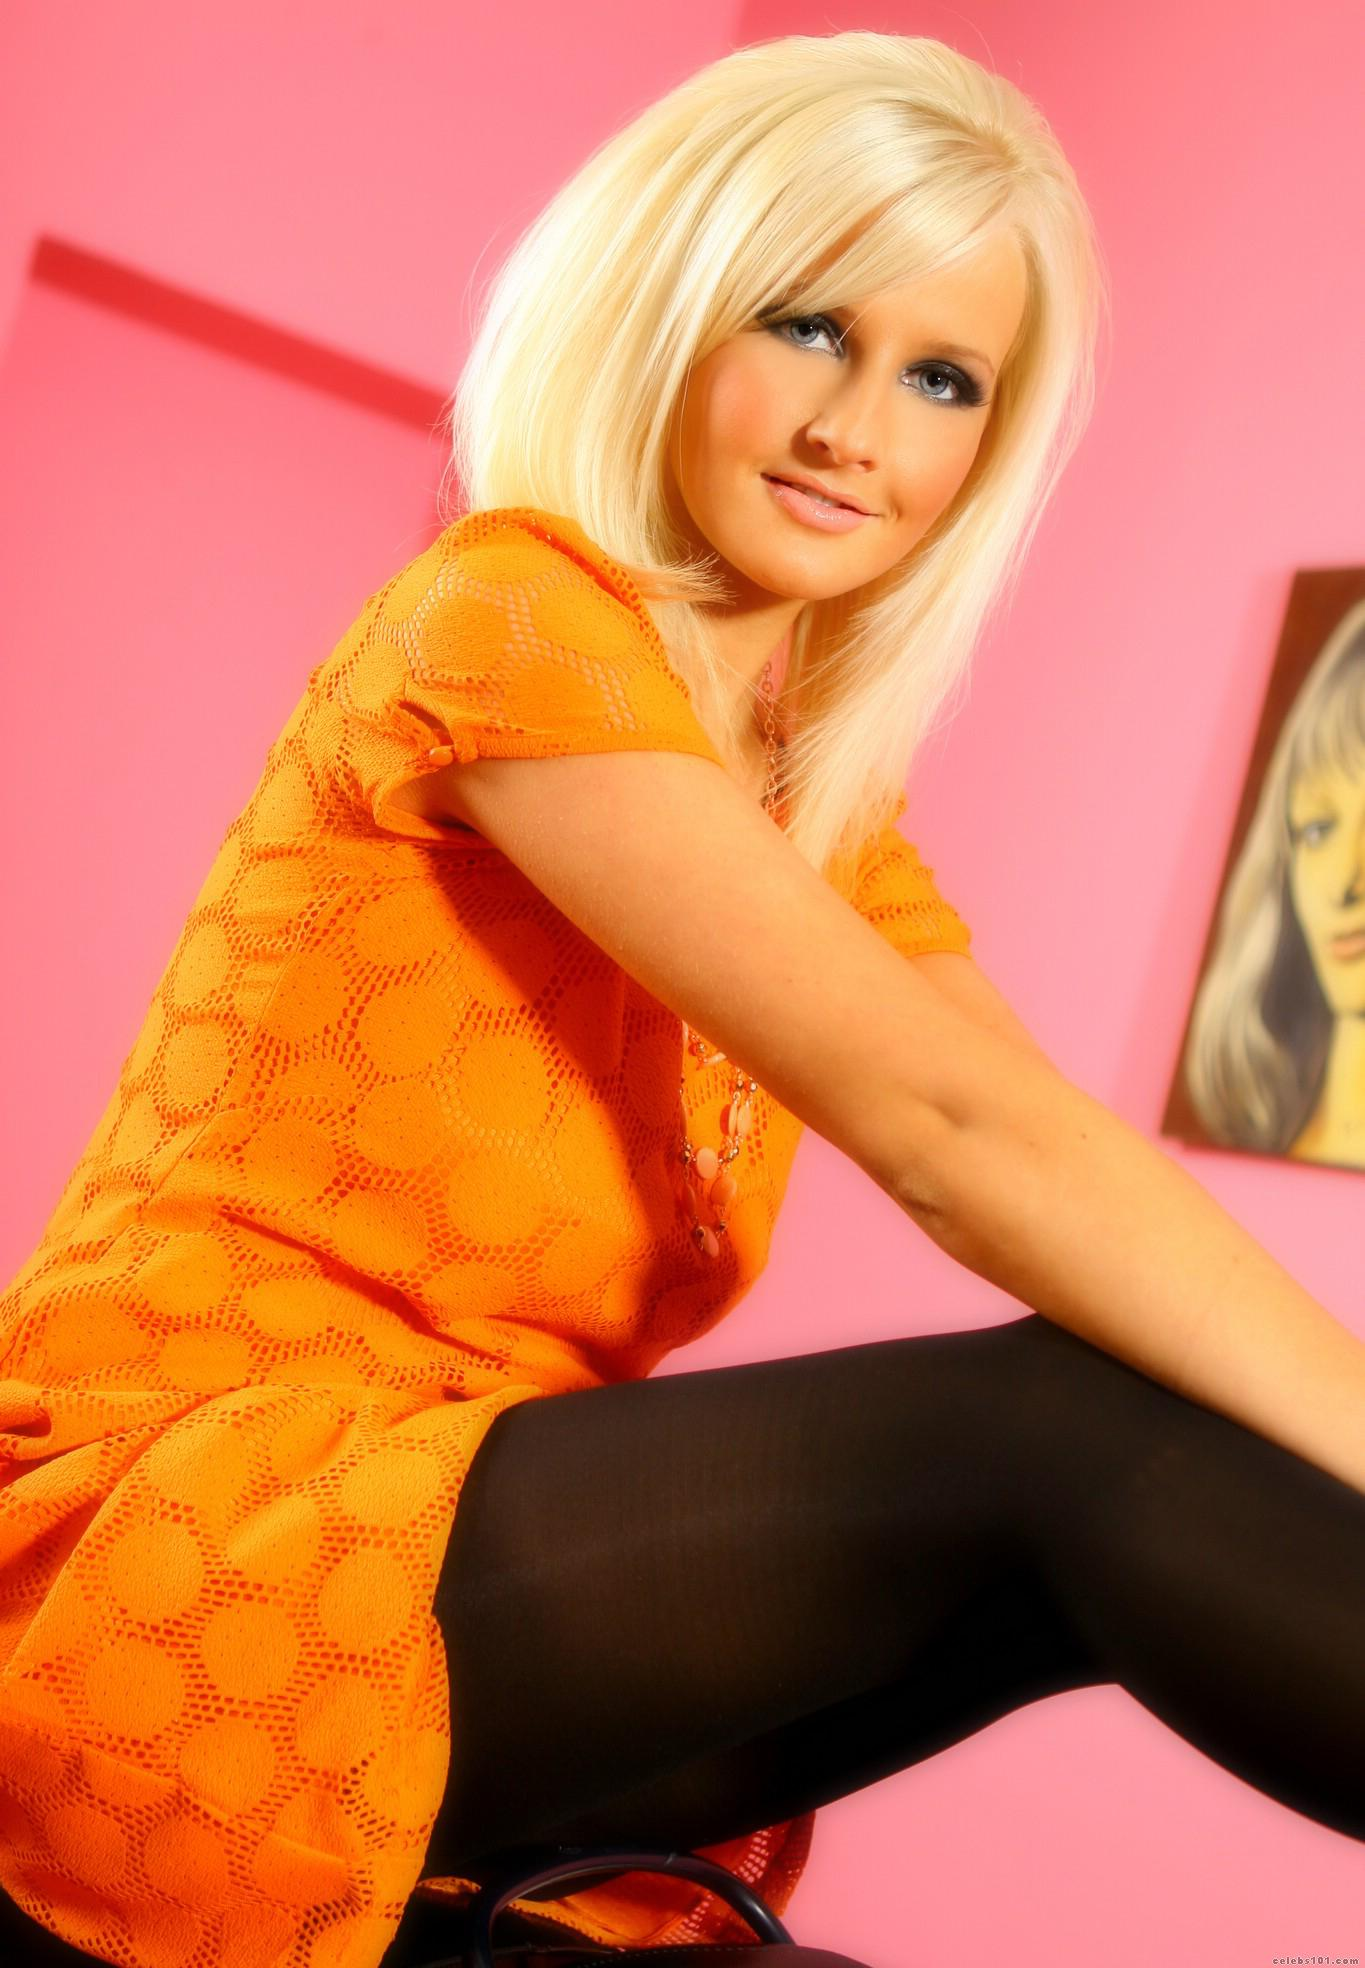 female celebrity michelle marsh - photo #22